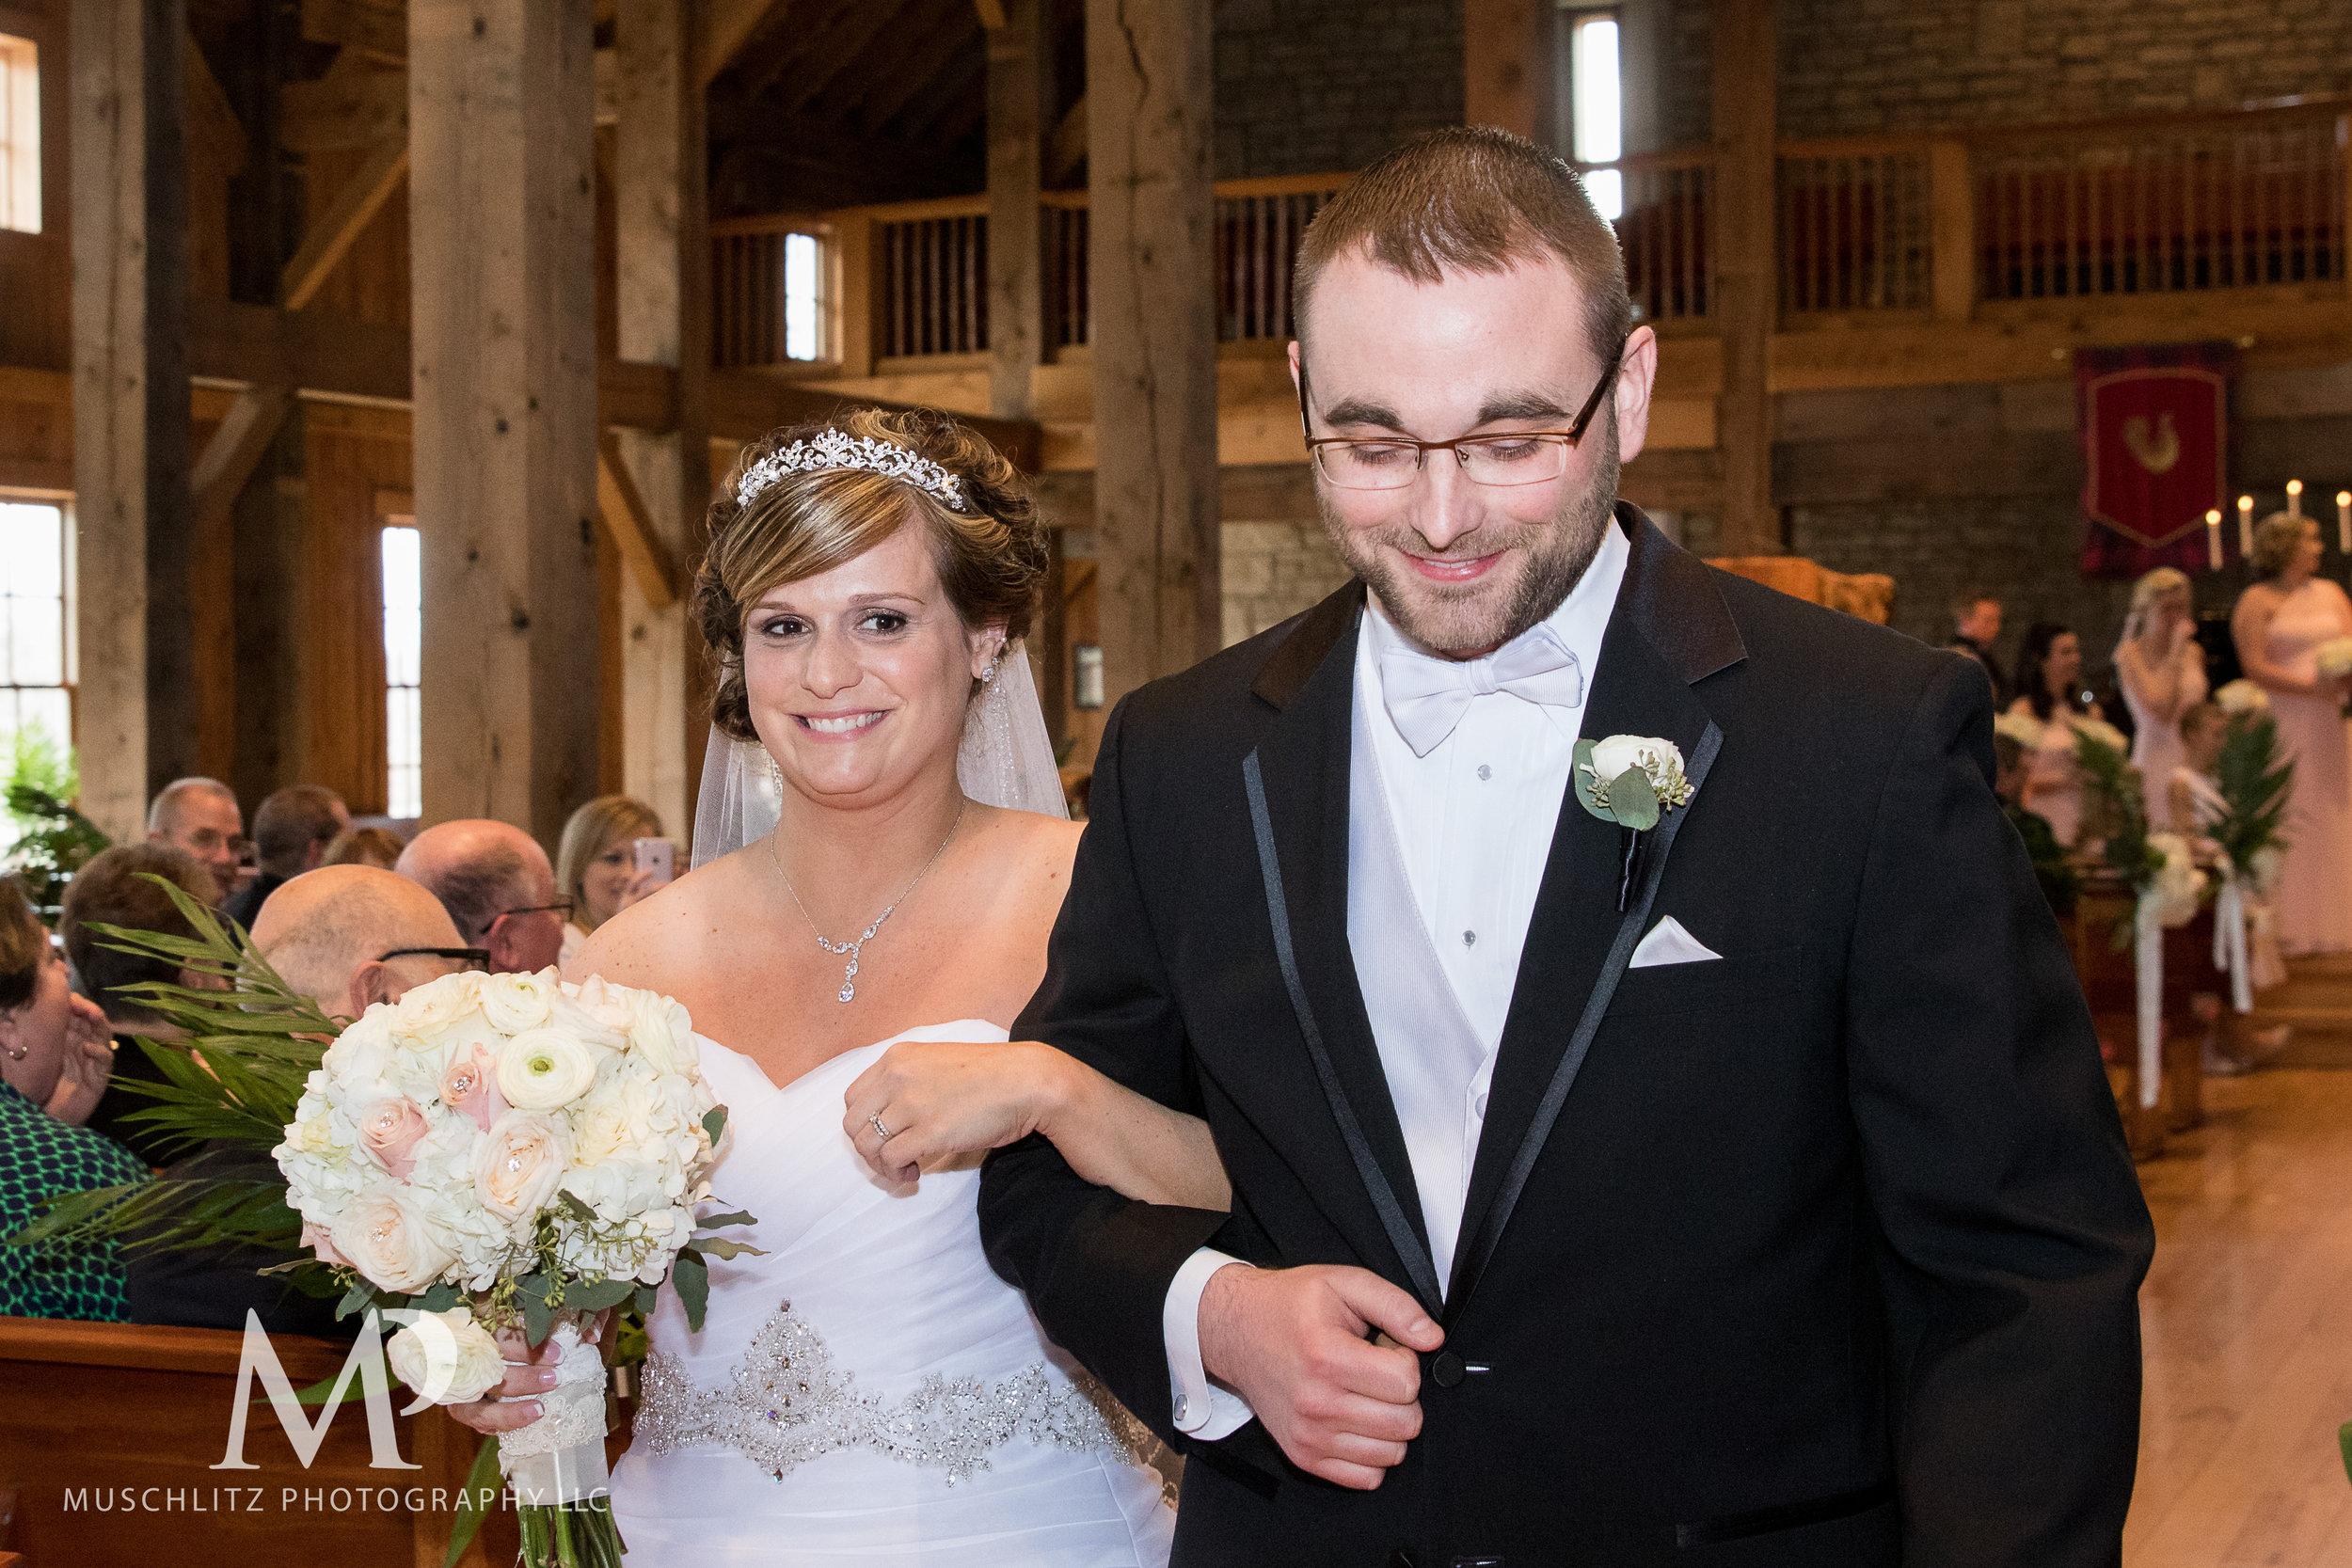 liberty-barn-presbyterian-church-wedding-delaware-columbus-ohio-muschlitz-photography-043.JPG